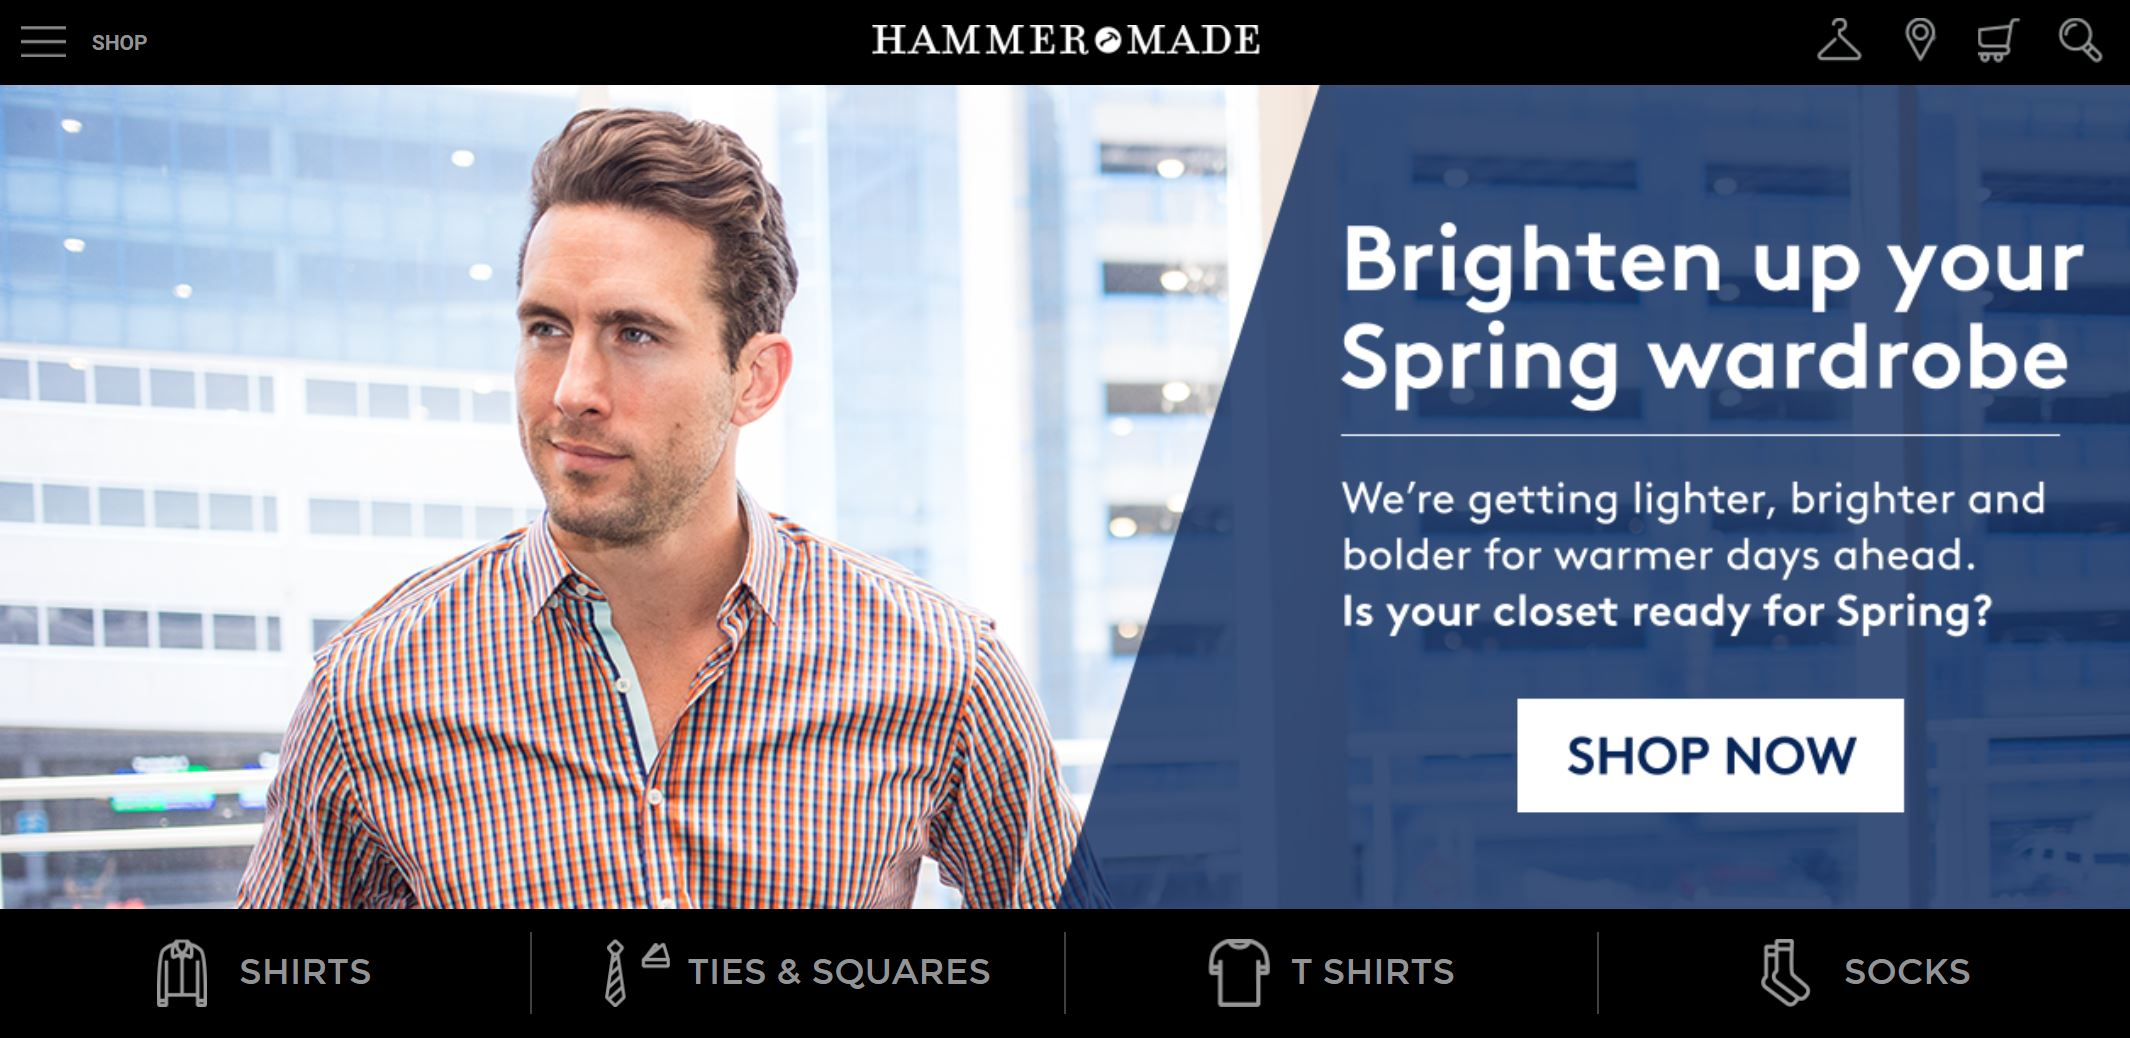 hammermade homepage screenshot